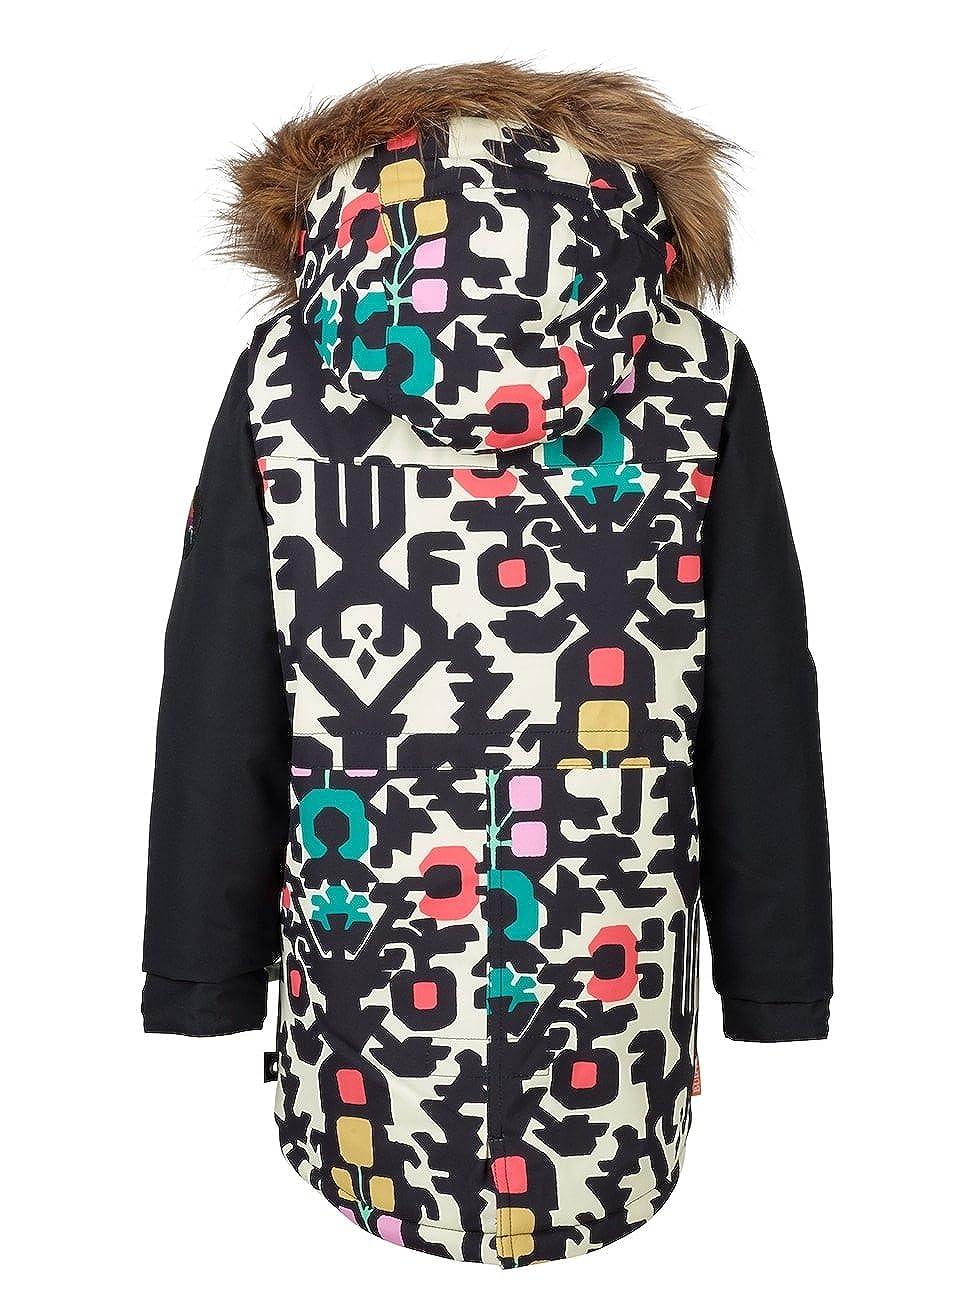 Amazon.com: Burton Girls Ms Aubrey Jk Yngflk Trublk-White-2T (86-89 cm): Clothing